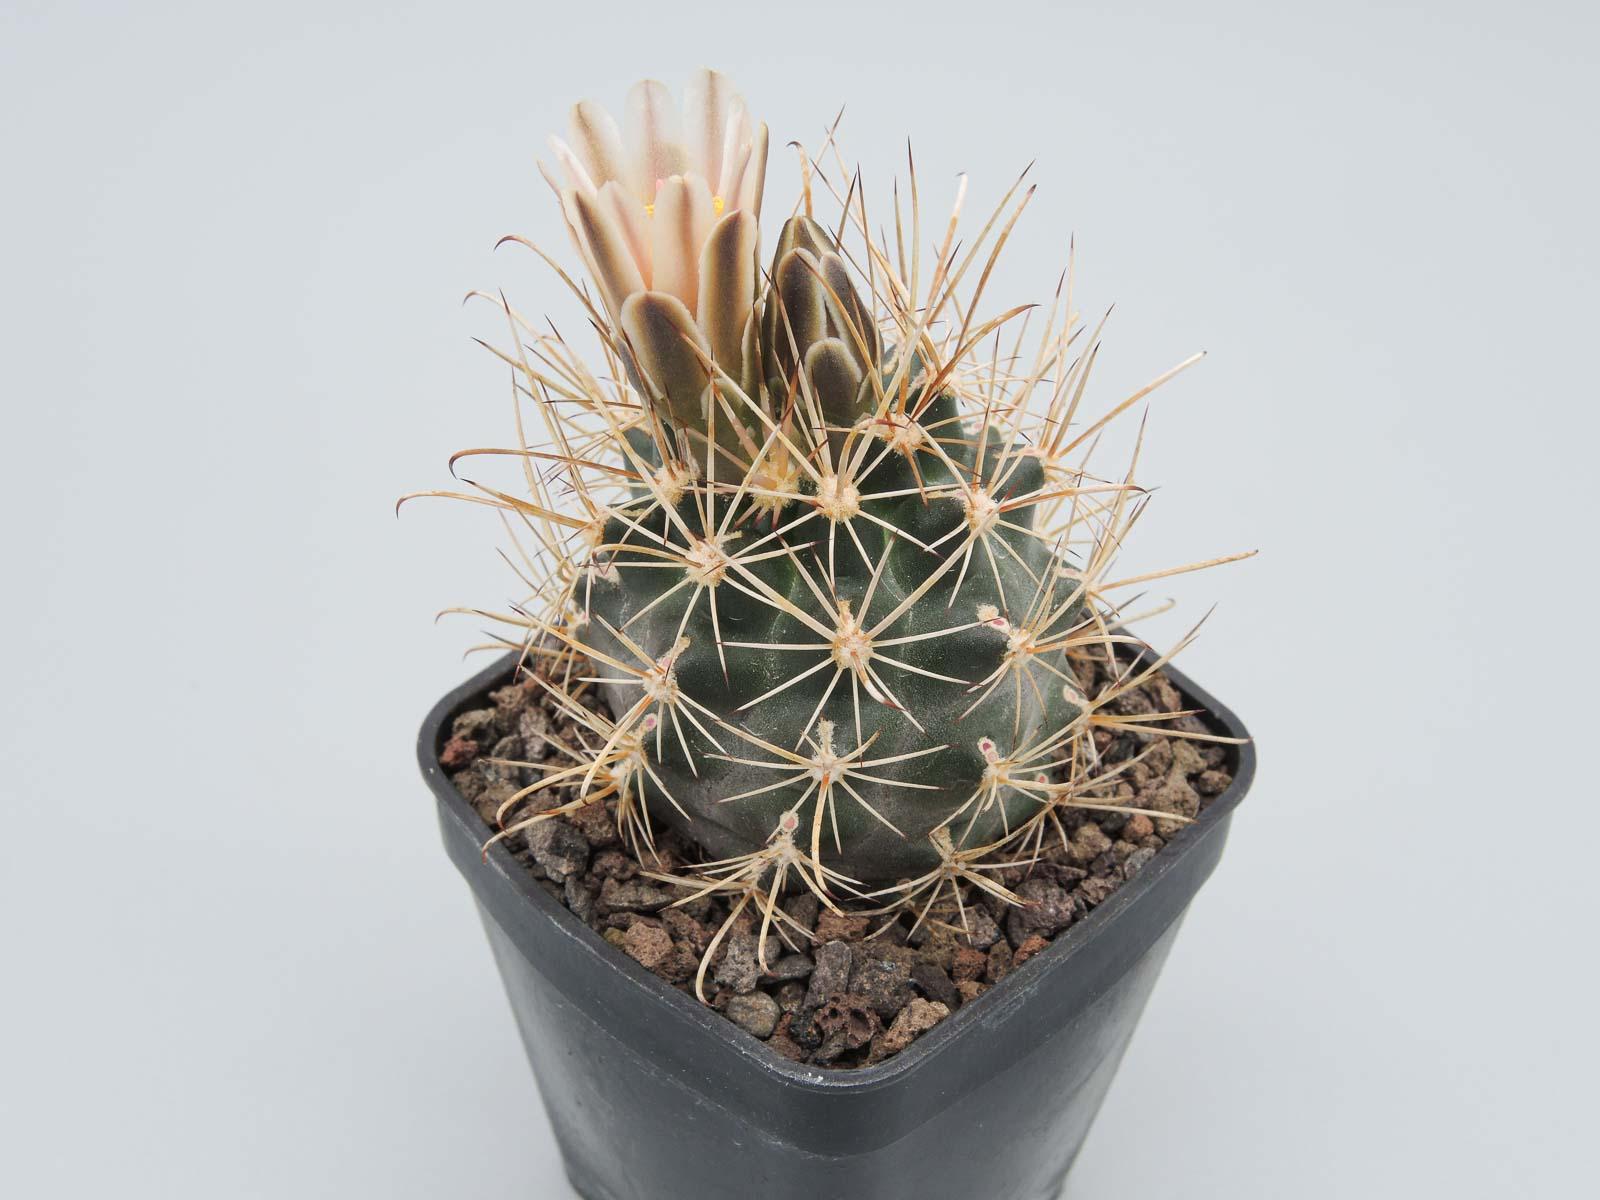 Ancistrocactus spec. Juarez-Progreso Coahuilense